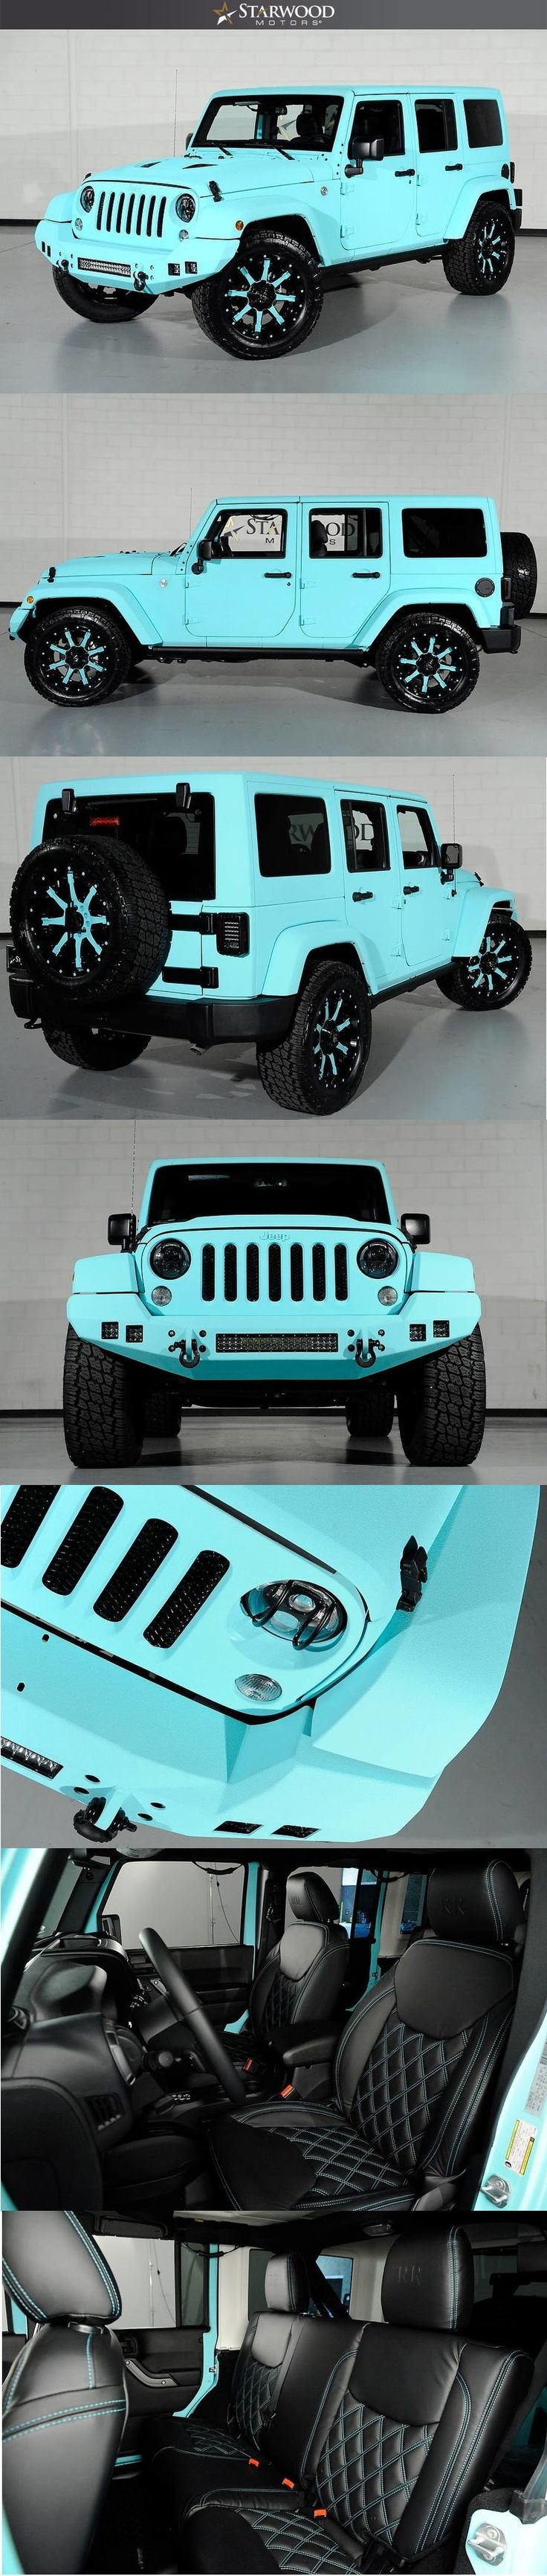 25 Best Ideas About Jeeps On Pinterest Jeep Jeep Cars